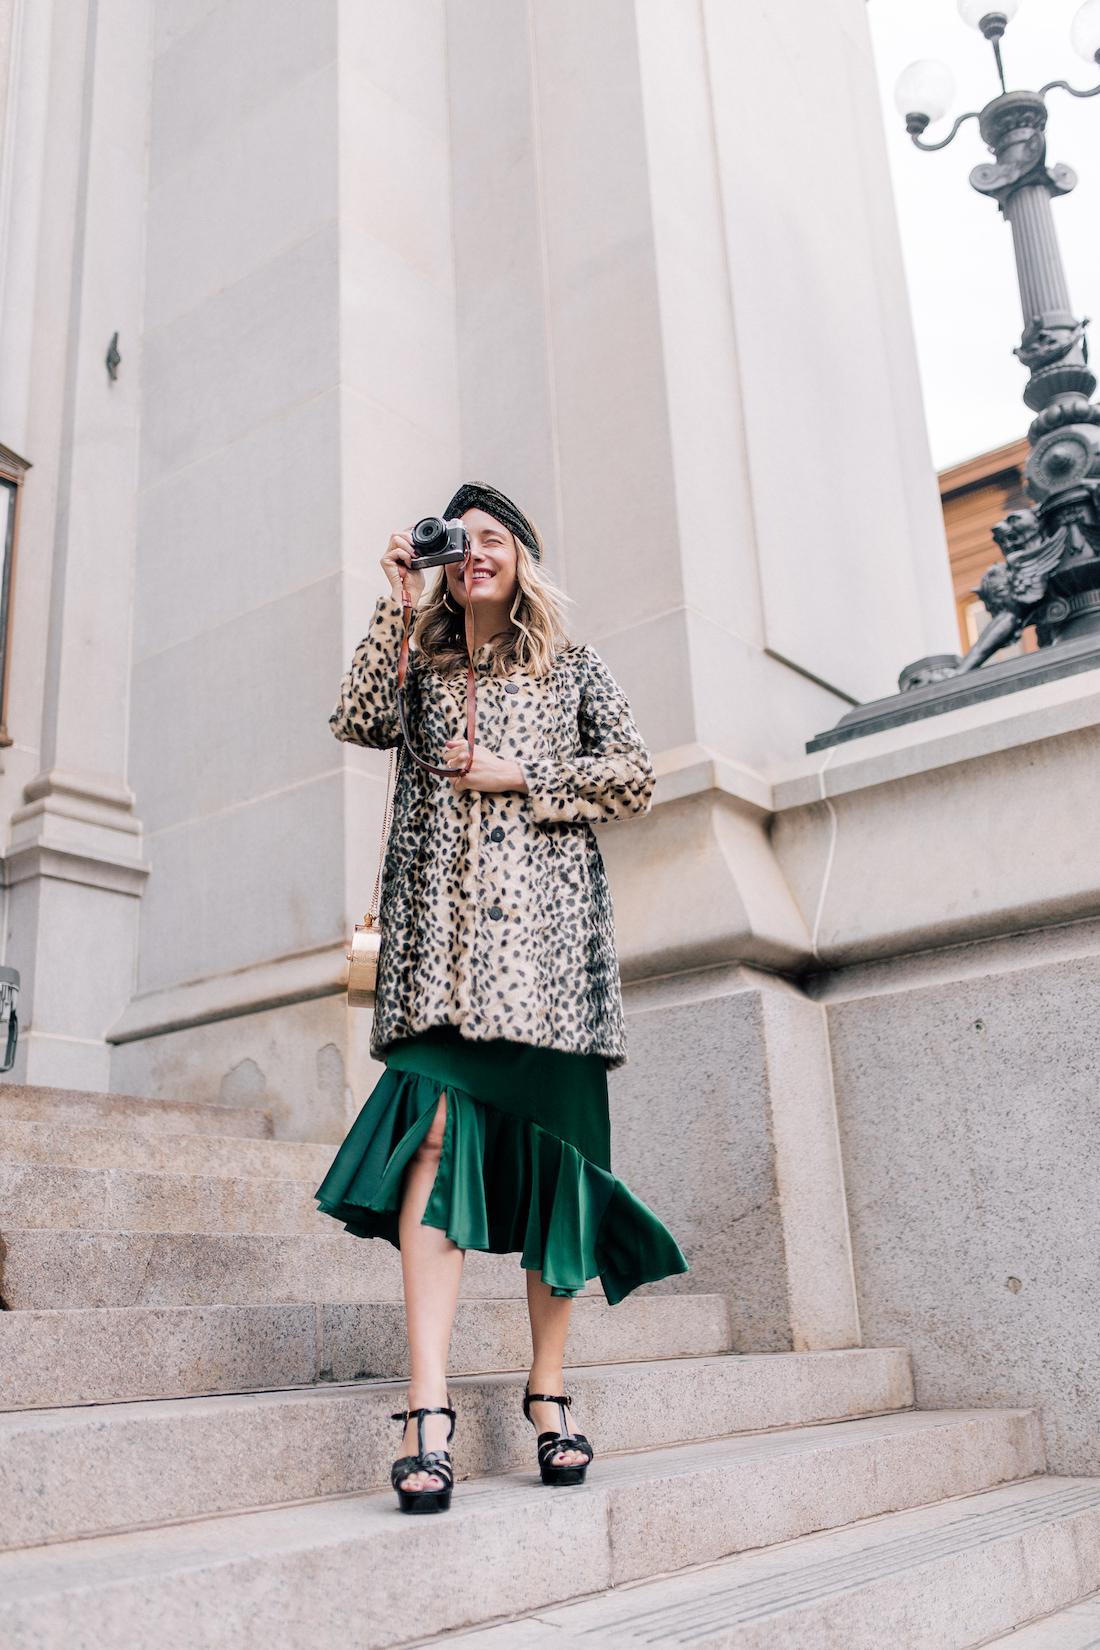 Viva Aviva Dress c/o// Animal Print Coat // Zara Sparkly Headband! // Saint Laurent Tribute Sandals // Okhtein Bag